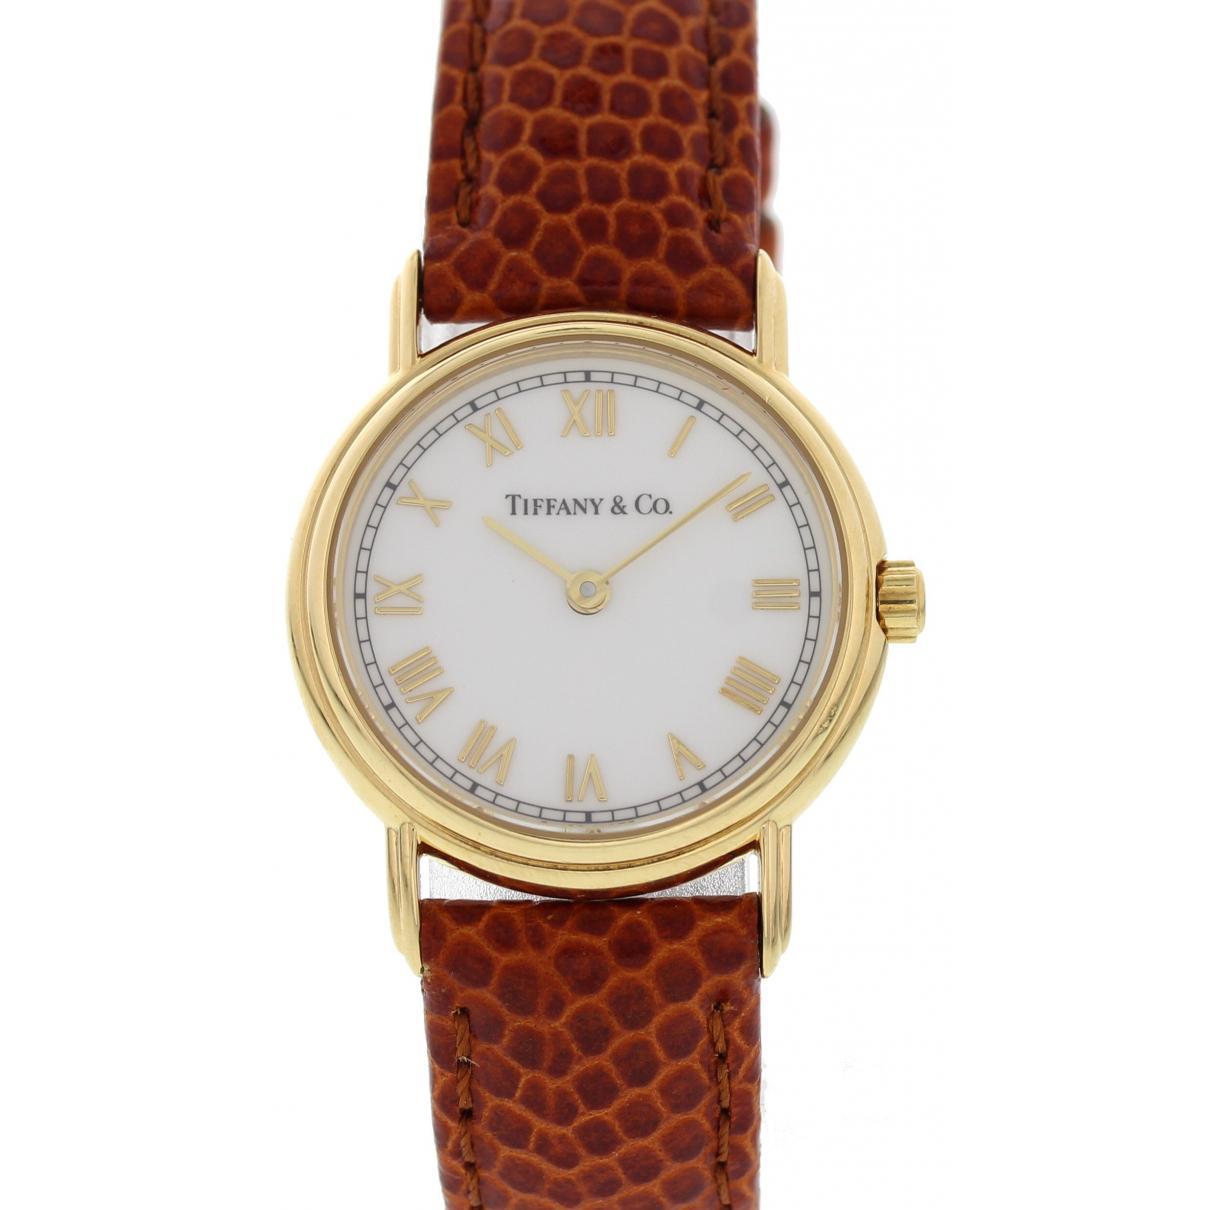 5adb390f49 Lyst - Tiffany   Co Yellow Gold Watch in Brown